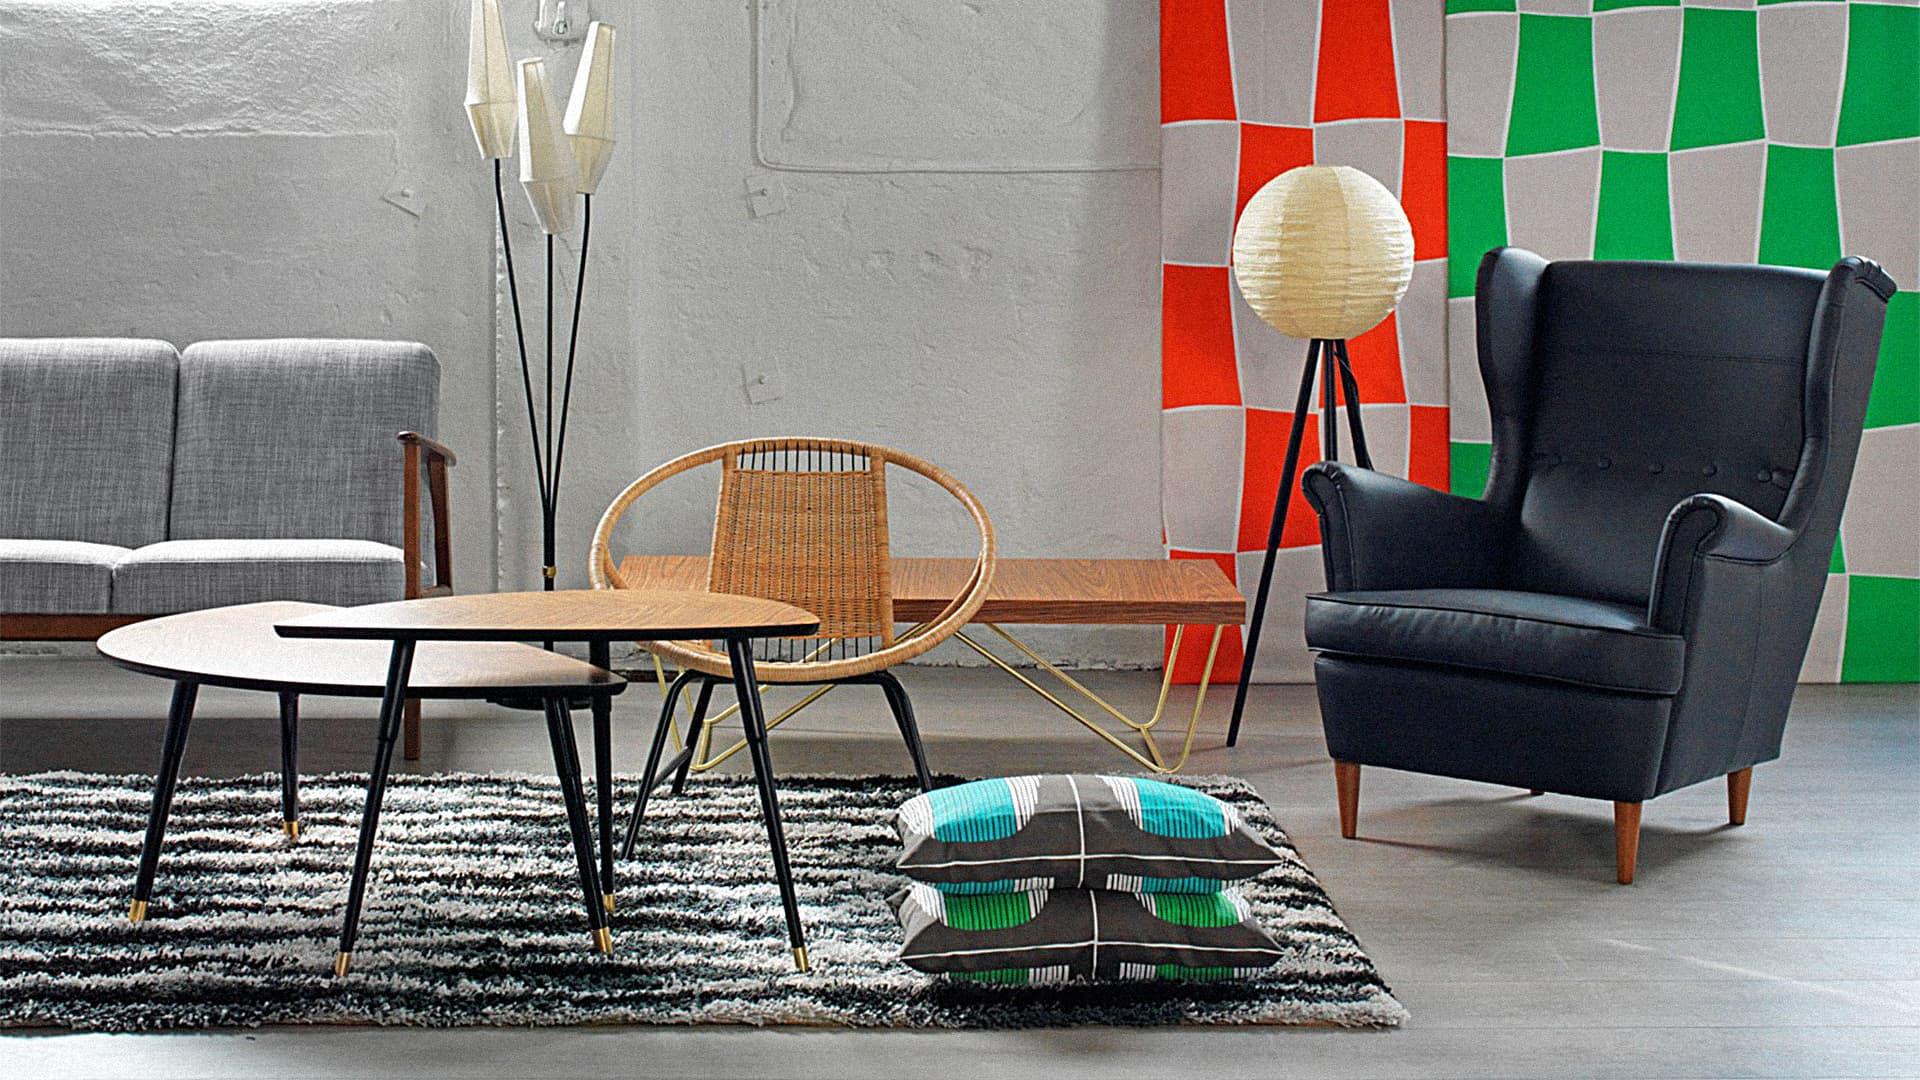 Ikea Original Mid century Furniture reedition vintage design